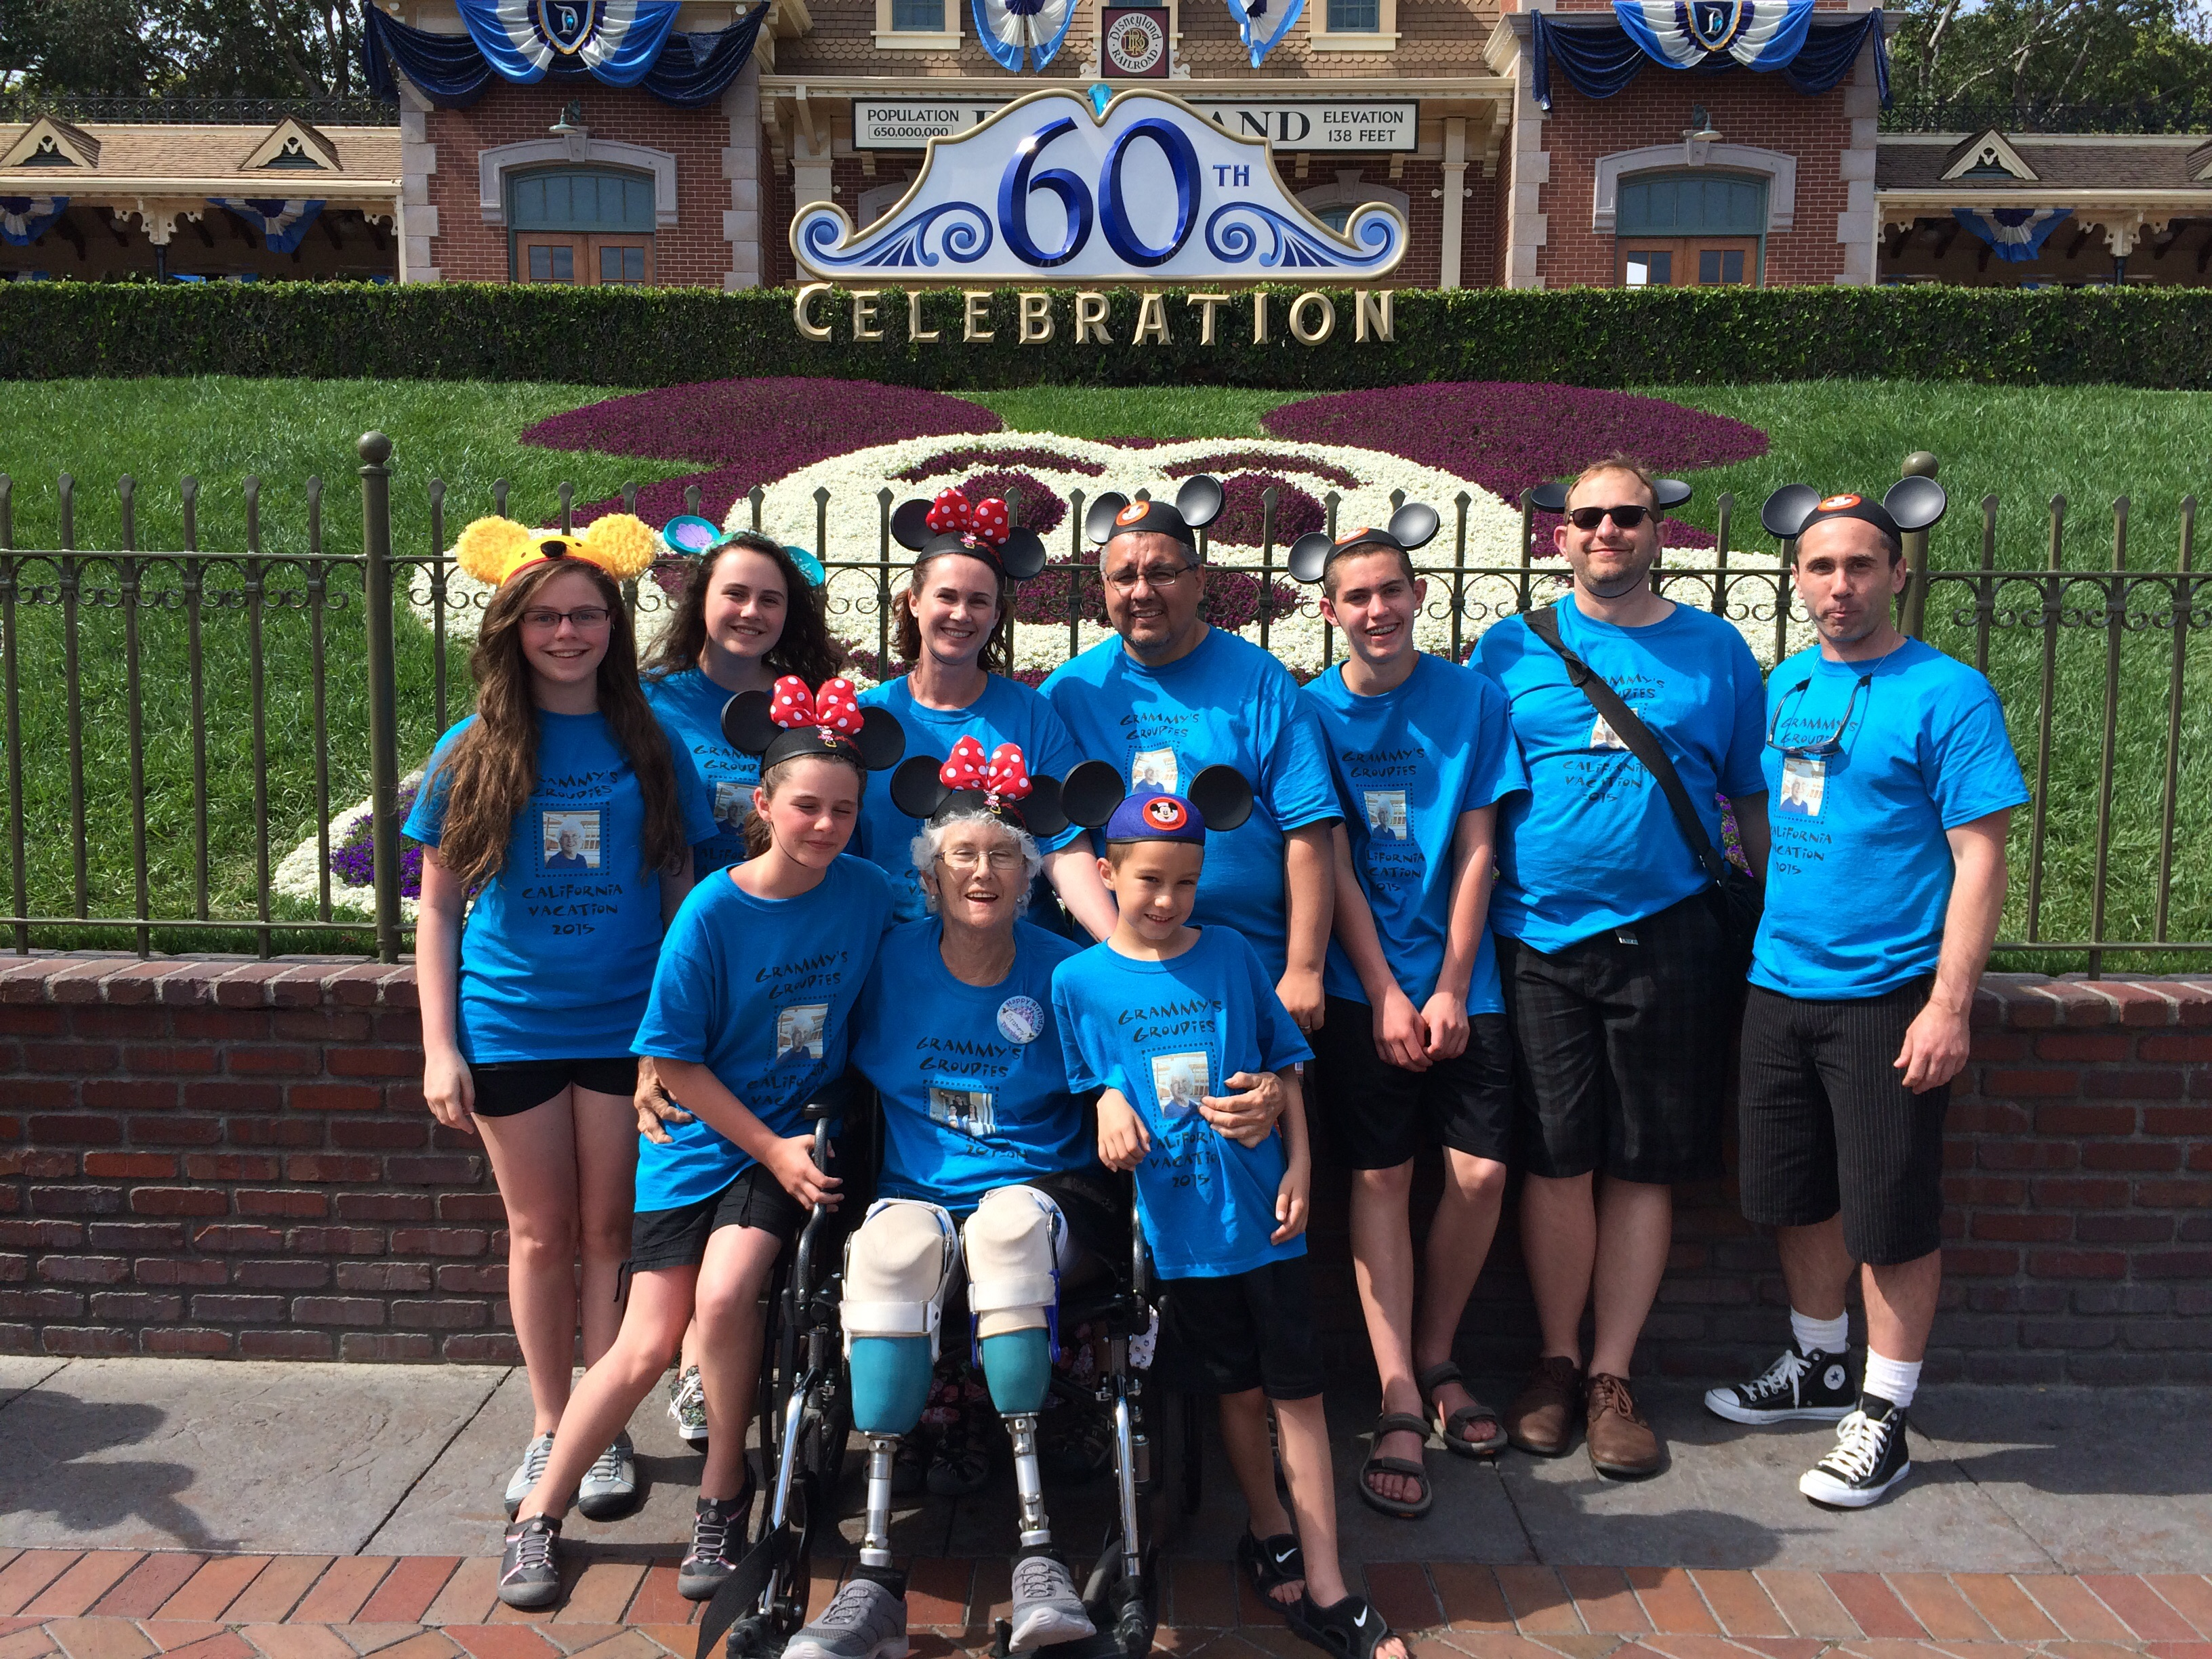 Grammys Groupies Trip To Disneyland T Shirt Photo